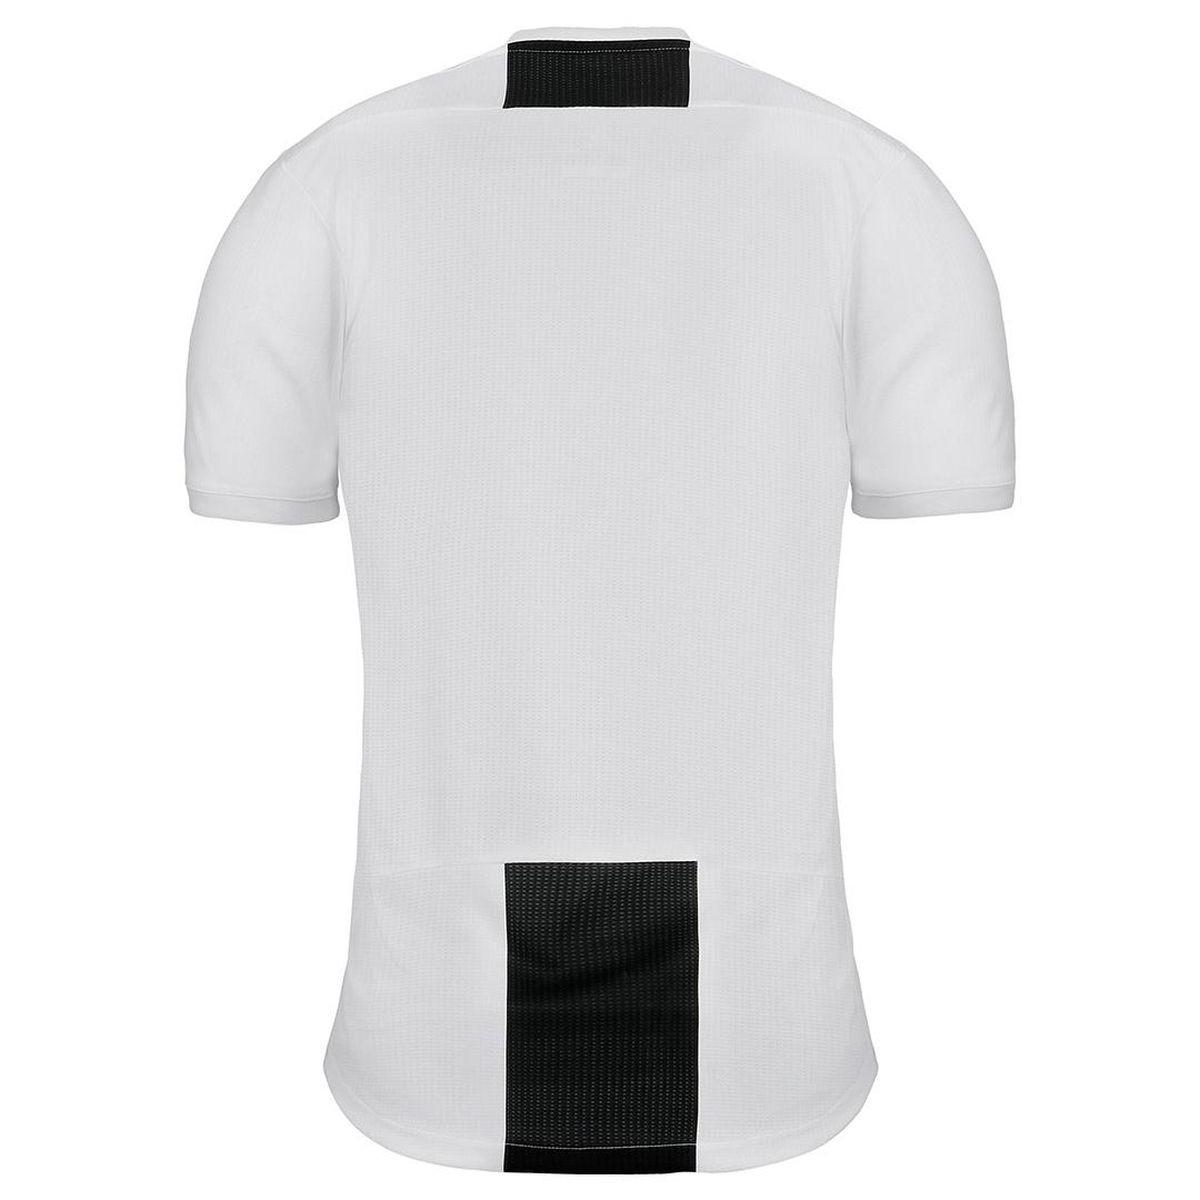 finest selection f769b ece01 Camiseta Juventus Primera Equipación 2018-2019 Black-White